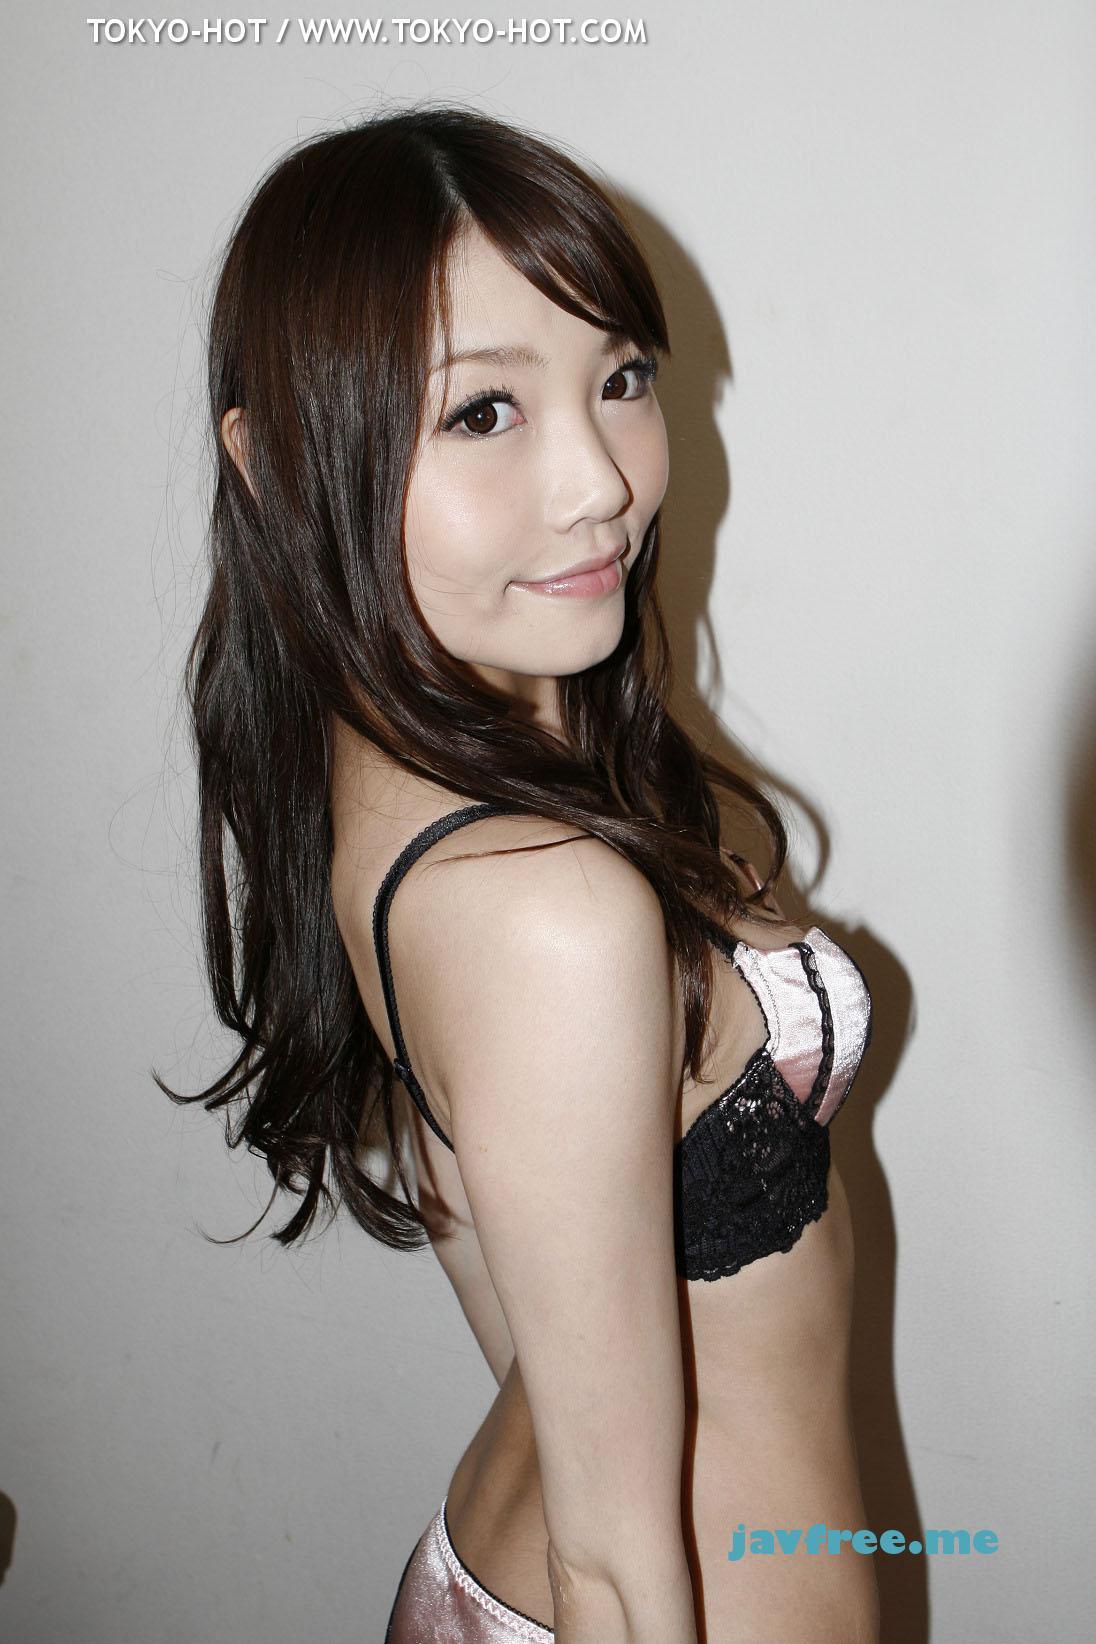 Tokyo Hot k0695 餌食牝 優木あおい Aoi Yuki 餌食牝 優木あおい Tokyo Hot Aoi Yuki